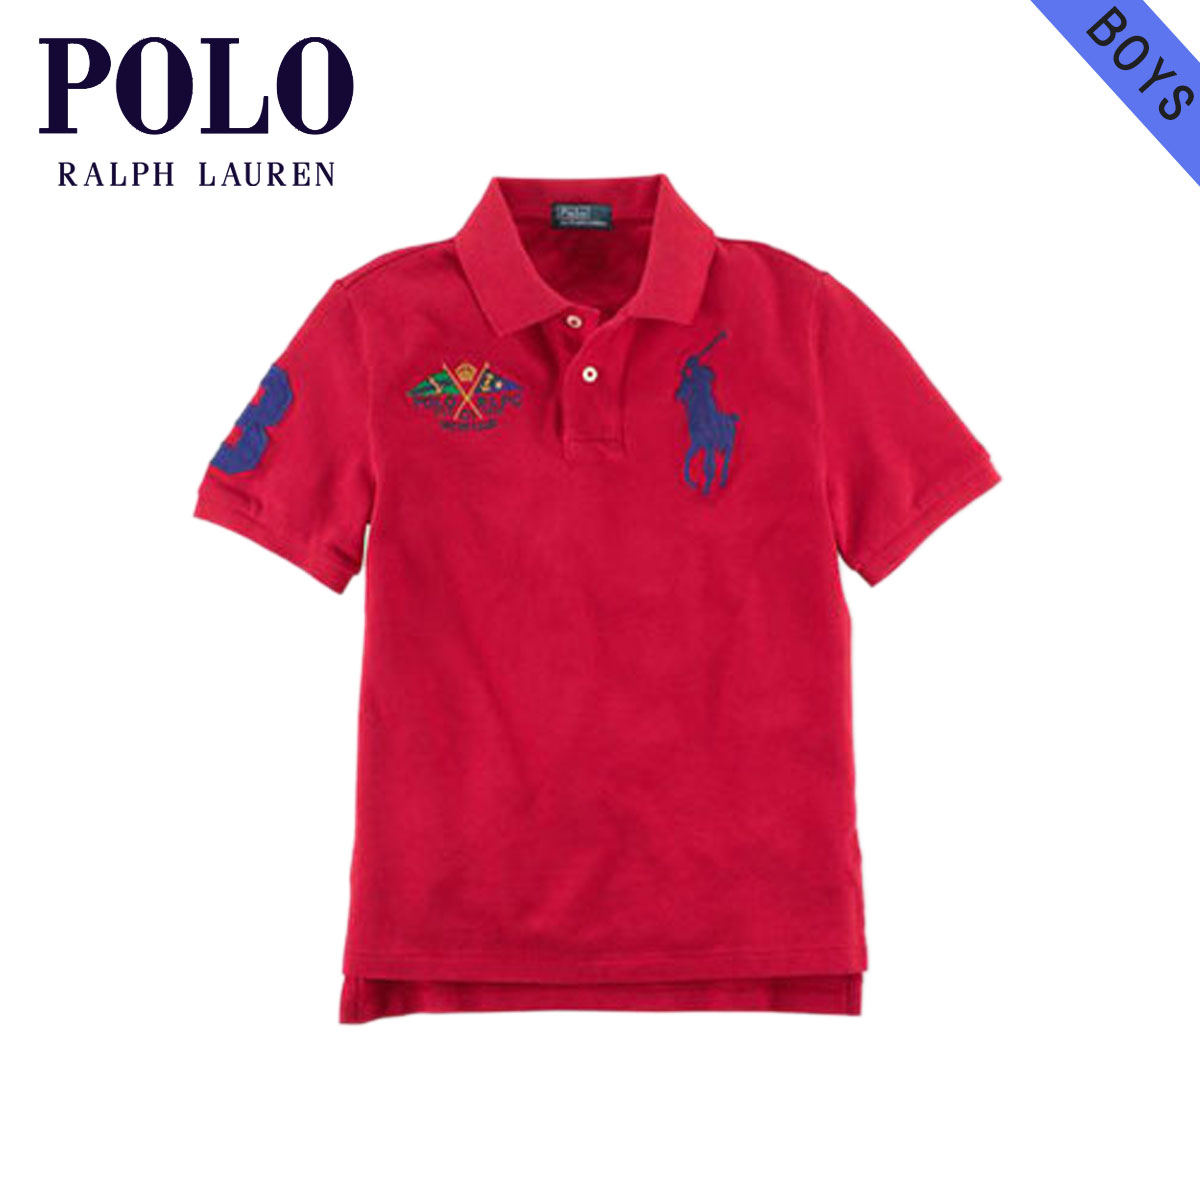 6a574ea0f3aa Poloralflorenkids POLO RALPH LAUREN CHILDREN genuine kids clothing boys Polo  Shirt Big Pony Flag Polo  18121136 RED 10P22Jul14